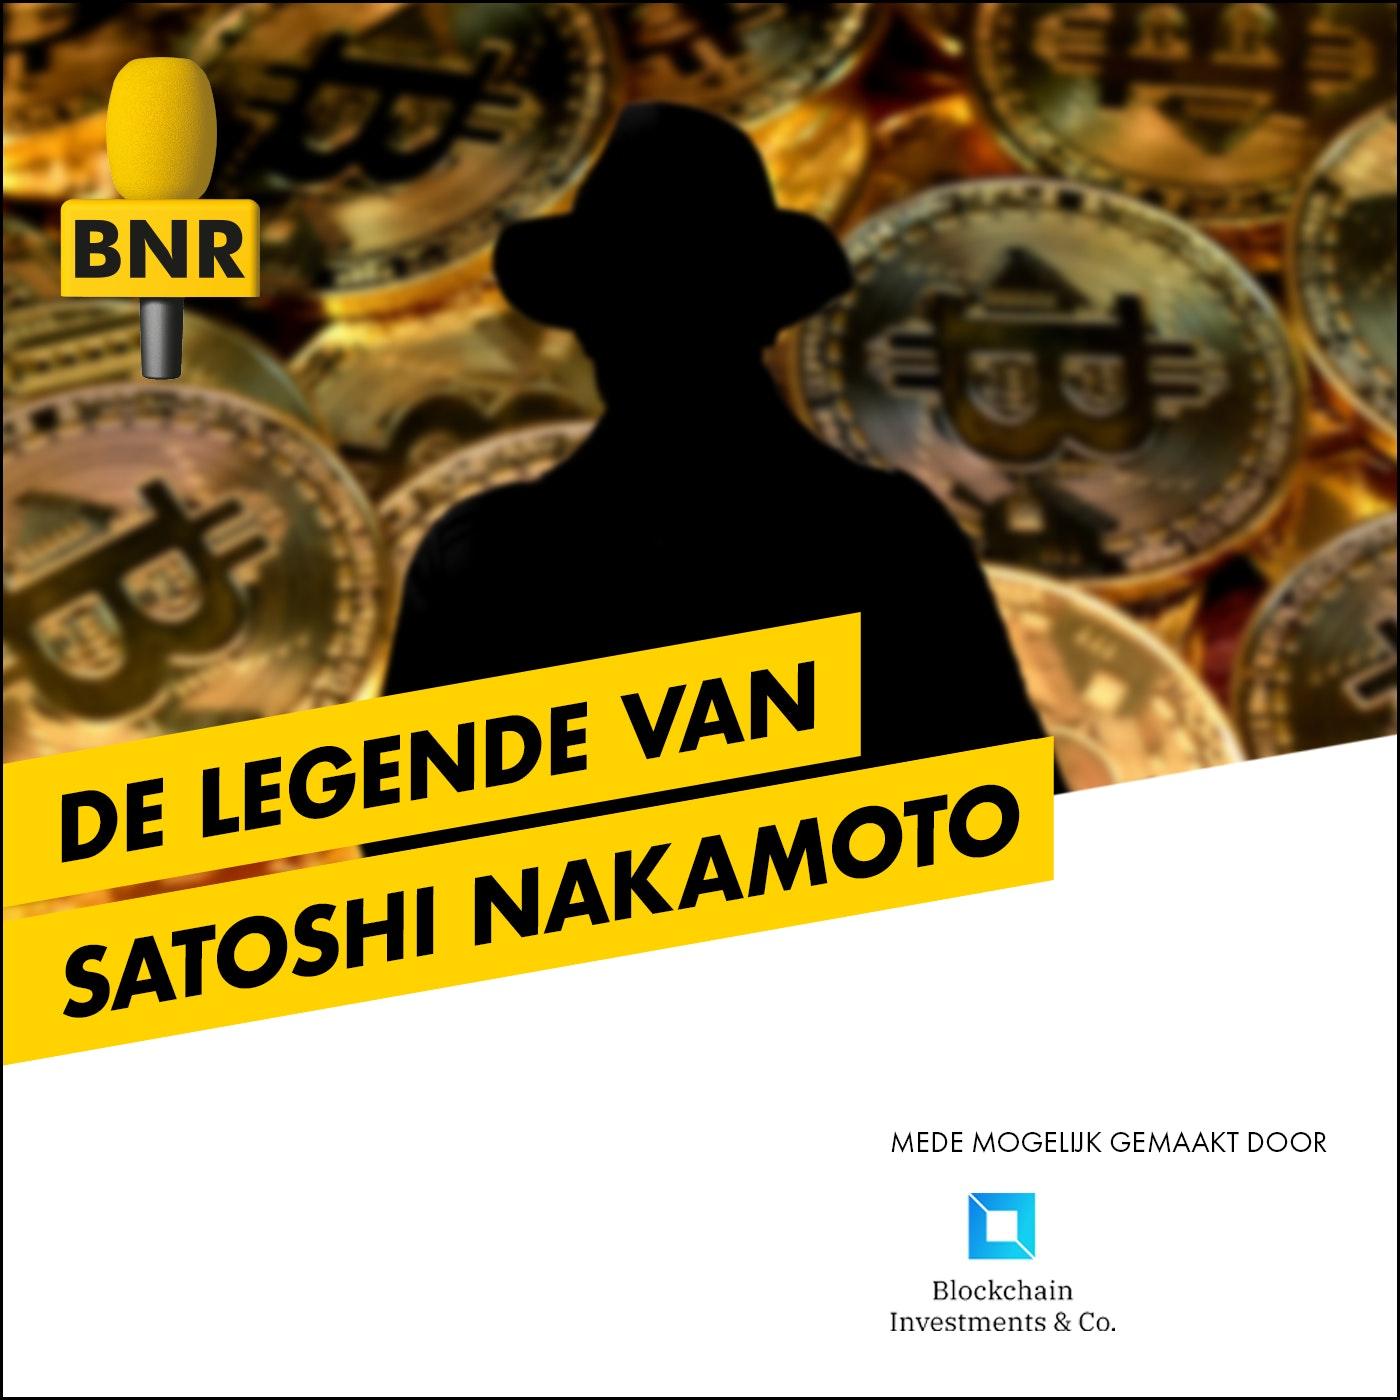 De Legende van Satoshi Nakamoto | BNR logo